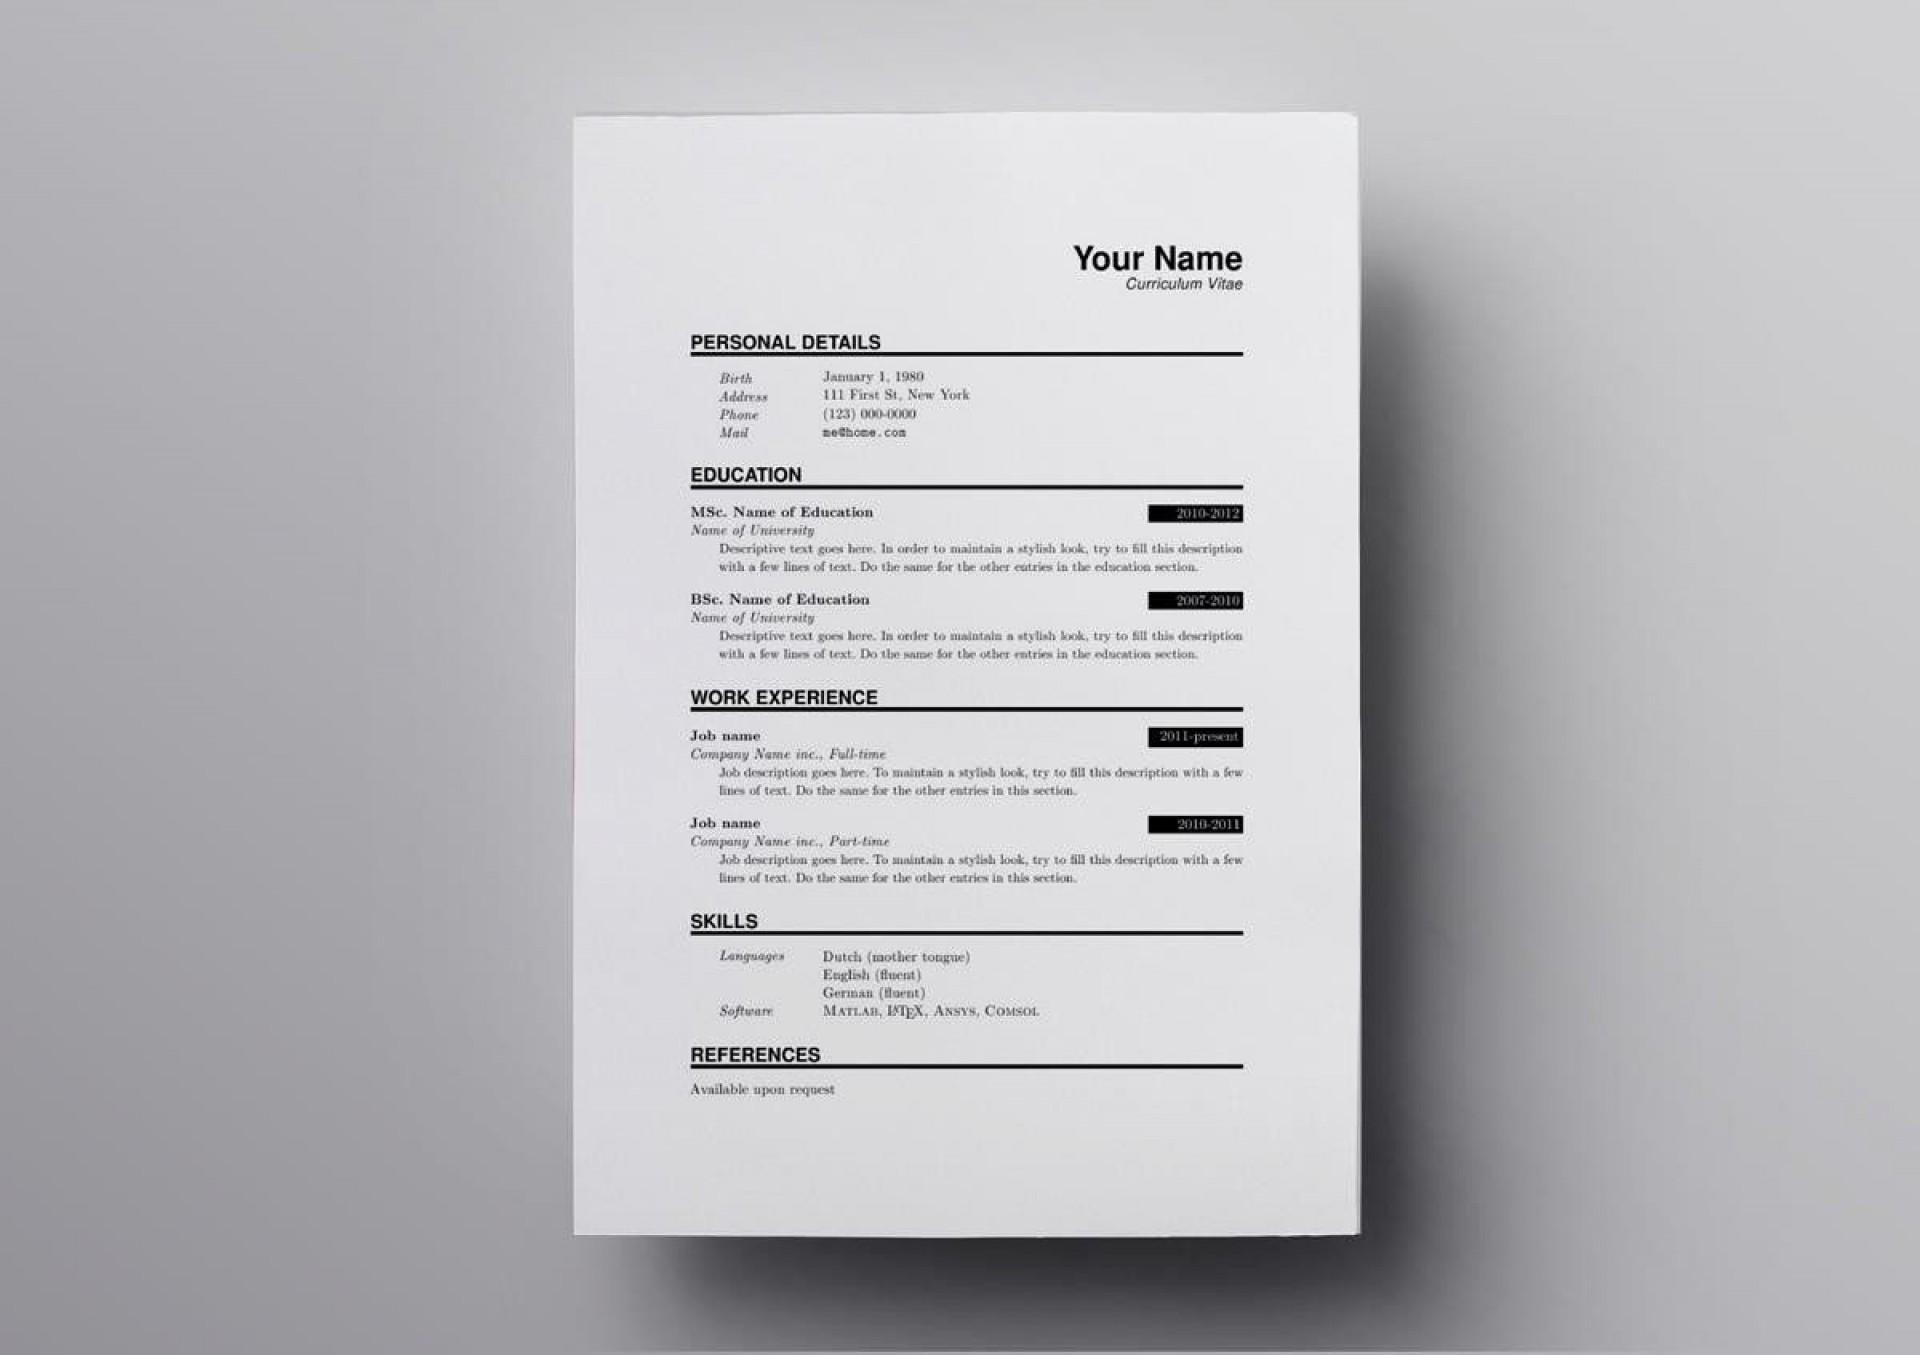 008 Top Latex Resume Template Phd Inspiration  Cv Graduate Student Economic1920